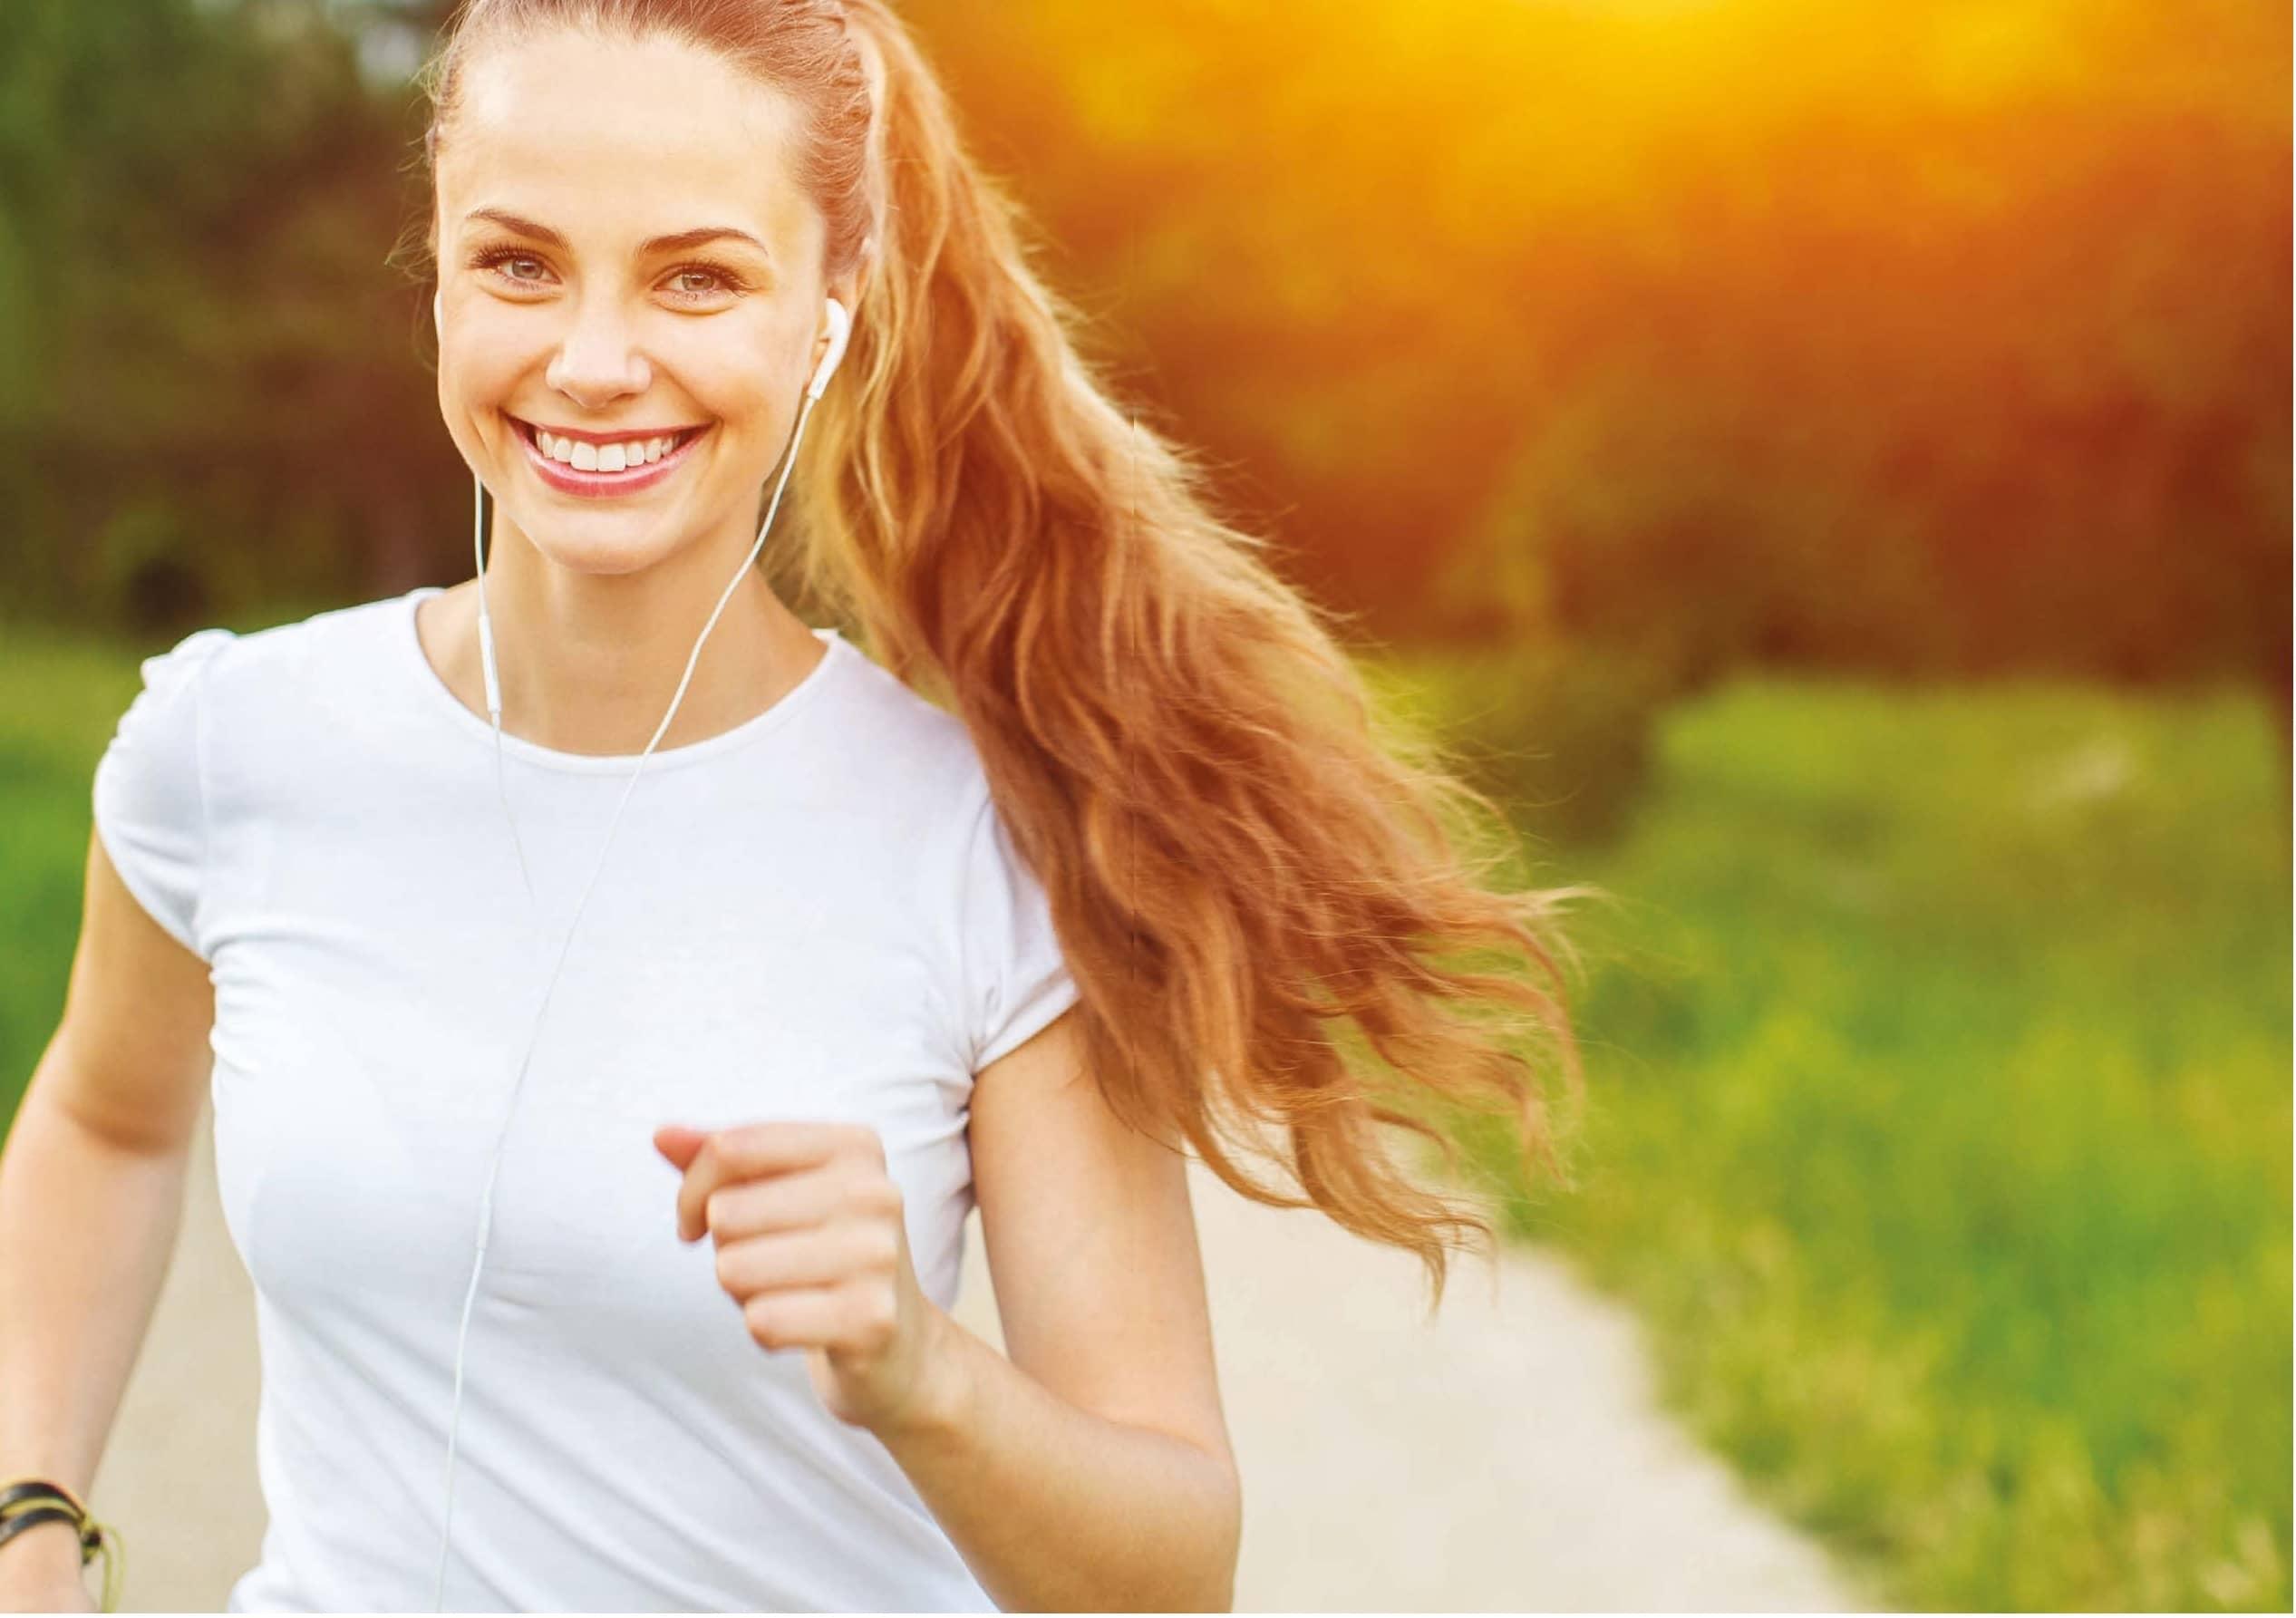 MICRO-RUNNING ADVENTURES